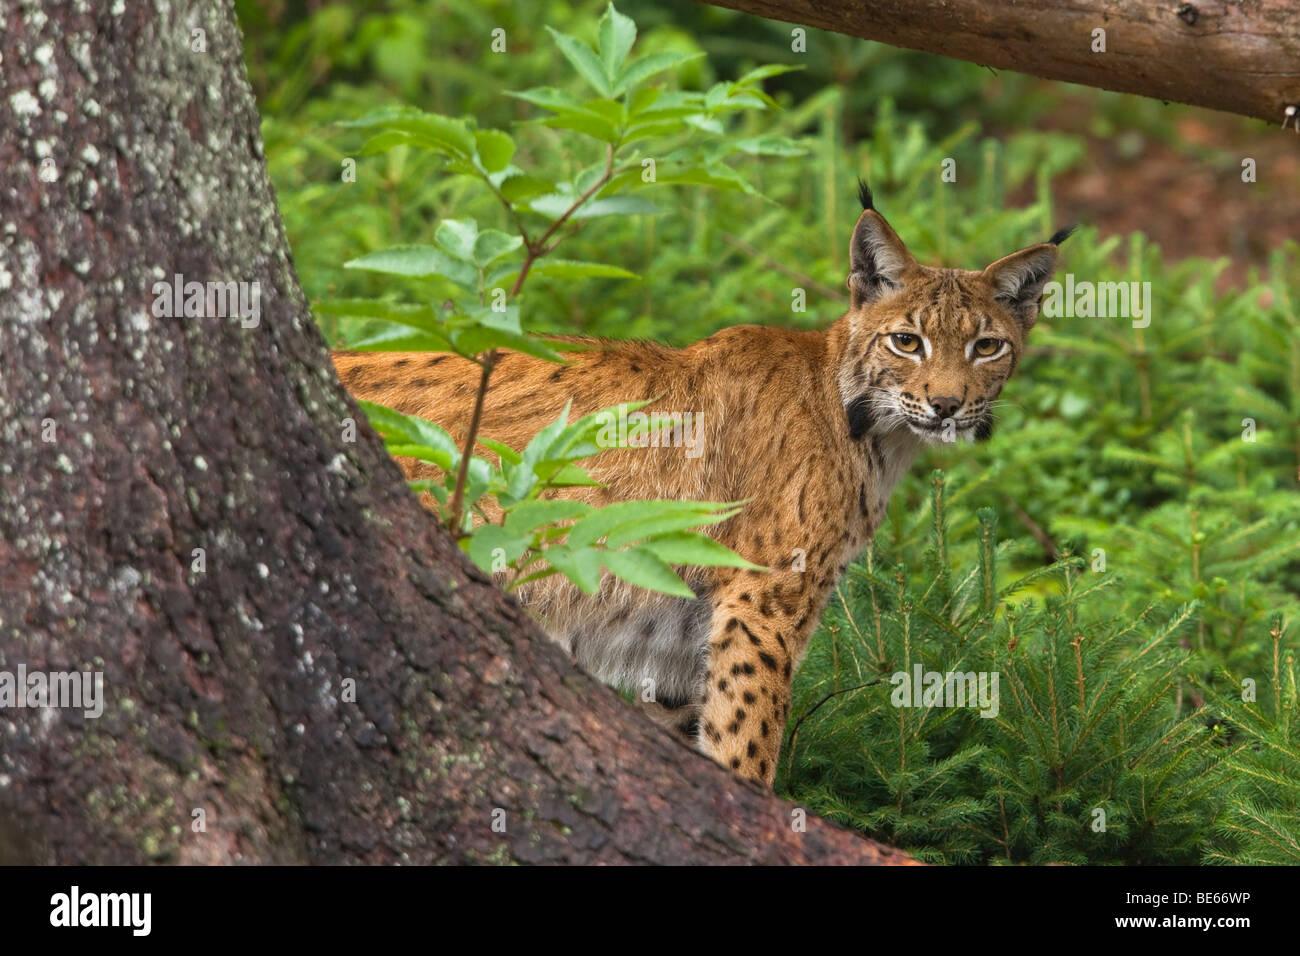 European Lynx (Felis lynx, Lynx lynx) standing behind a tree. - Stock Image